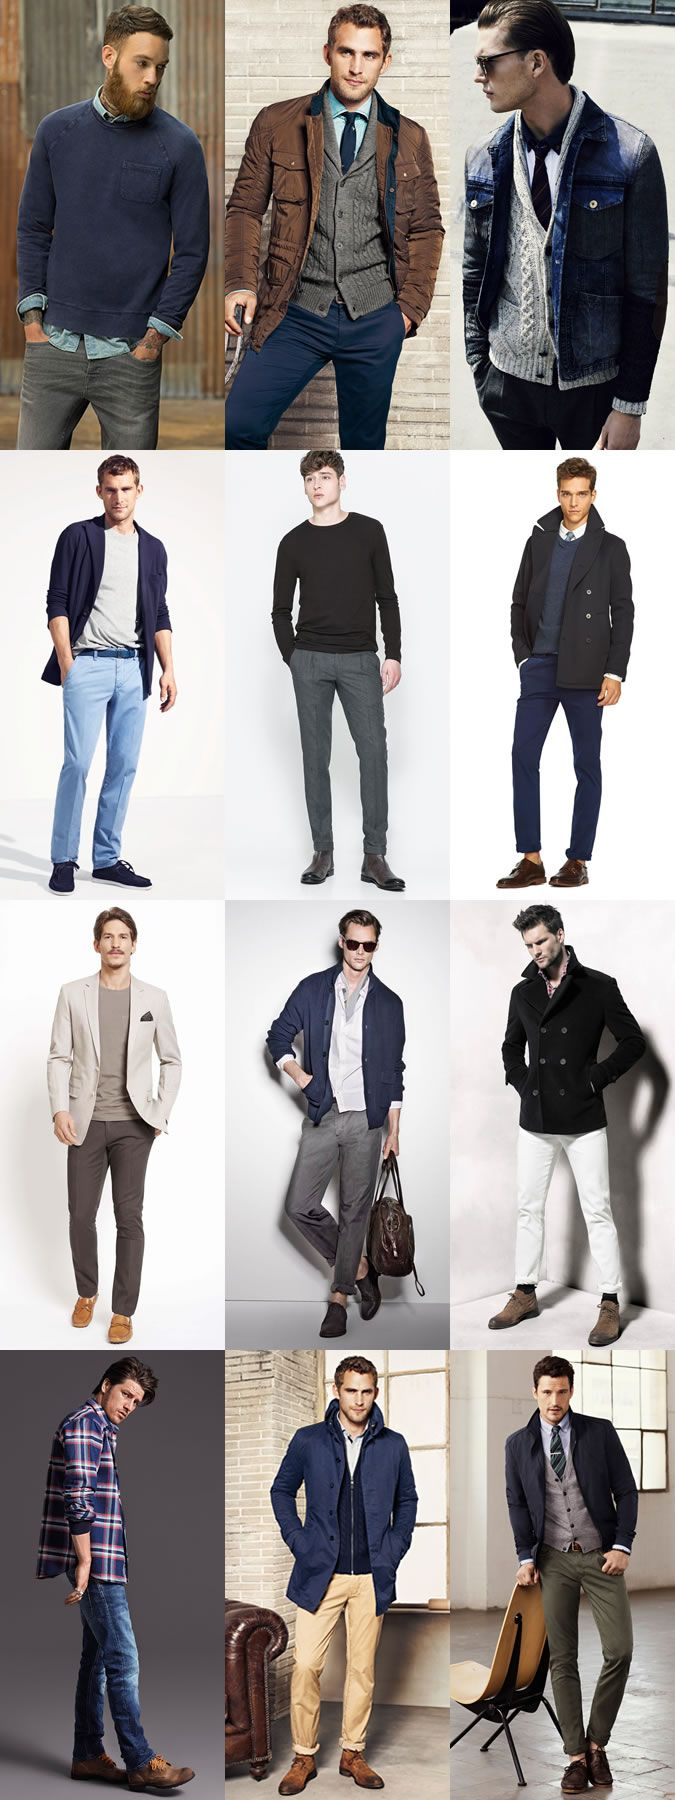 Men 39 S Classic Timeless Outfit Inspiration Lookbook Men 39 S Style Pinterest Herrmode Kl Der